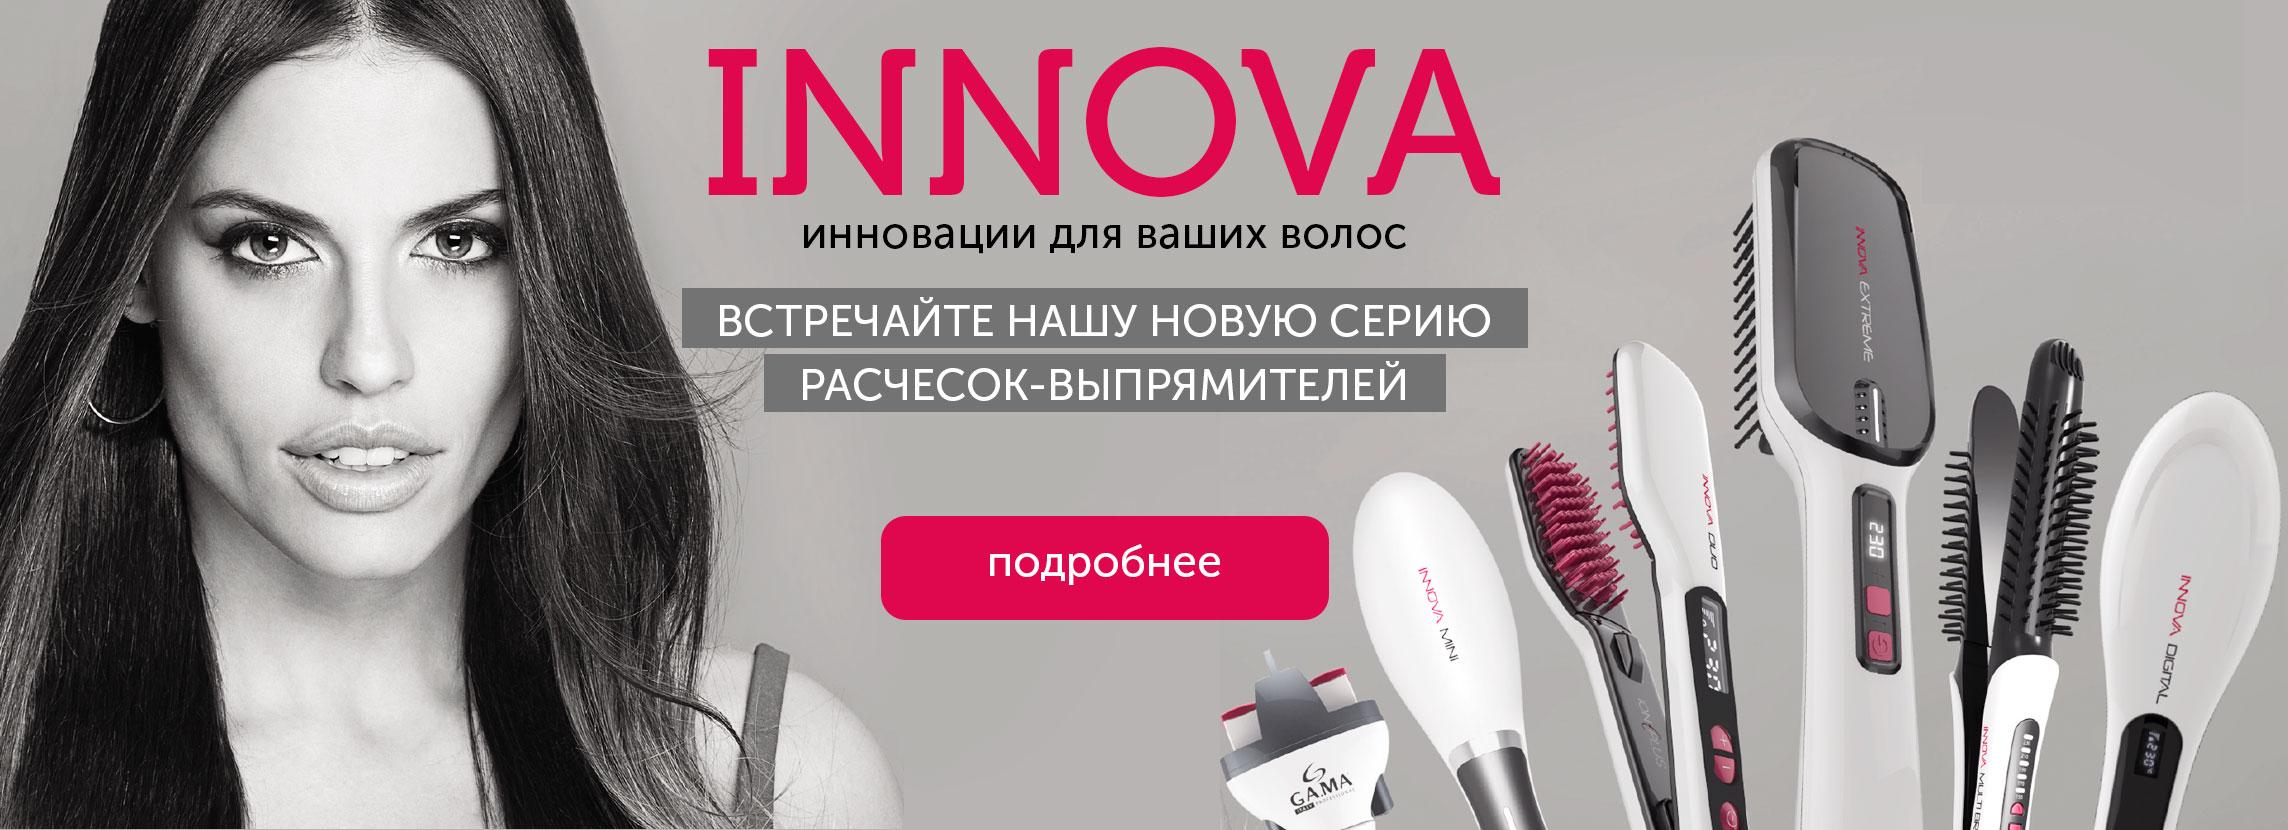 1501153543_0_innova_homepage-2288x830.jpg